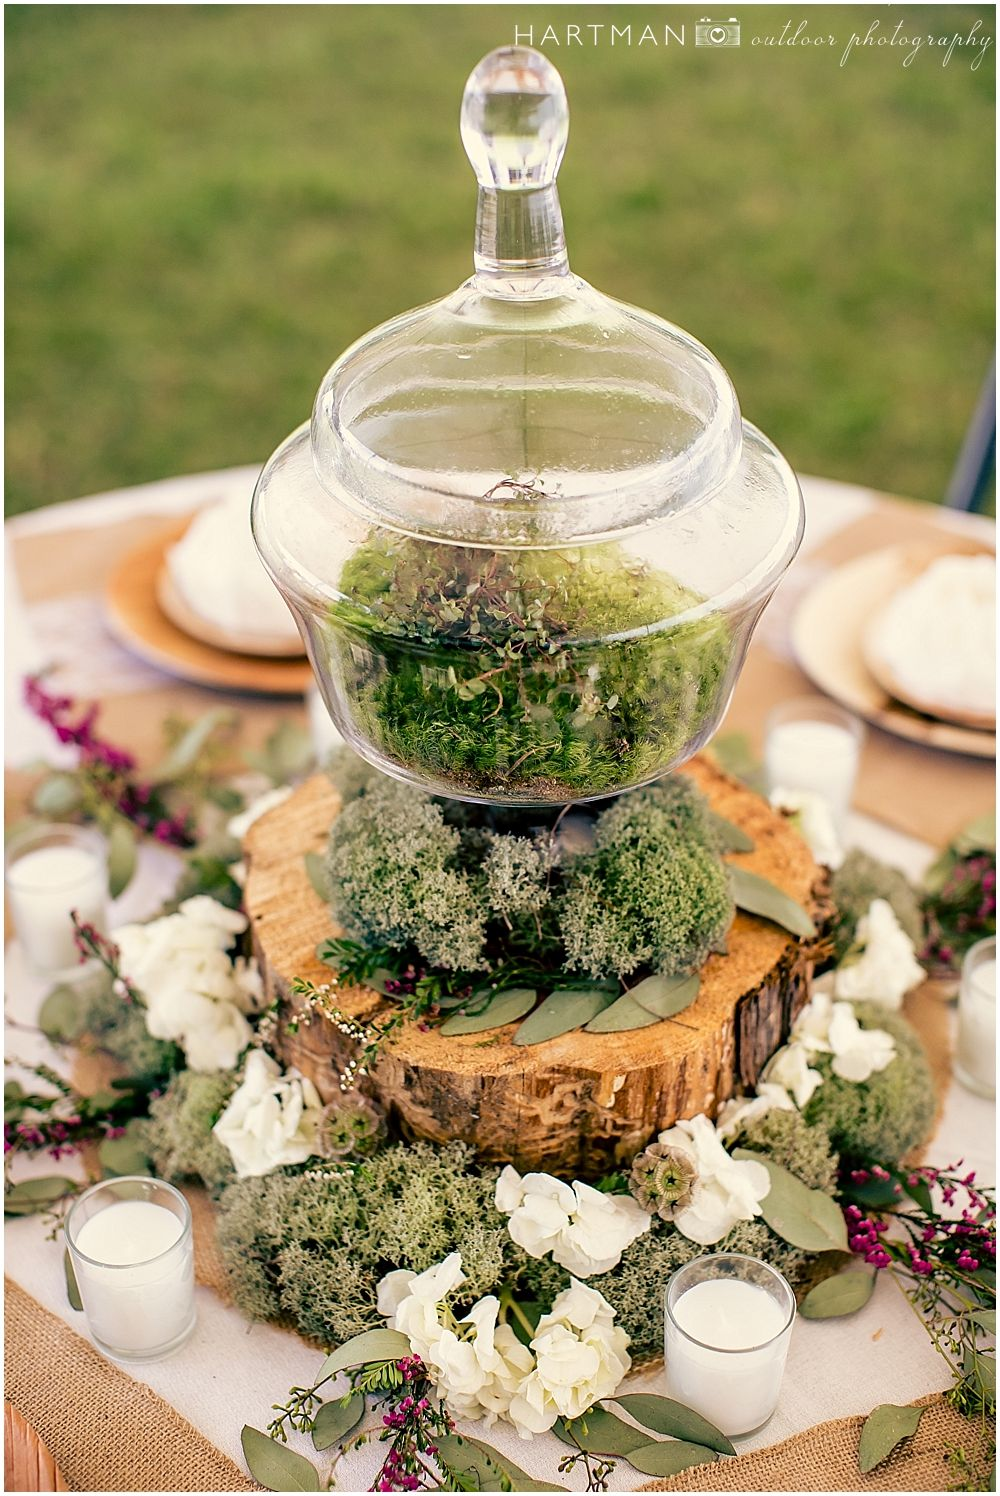 Moss Terrarium Centerpieces On Tree Trunk Slices Raeford Outdoor Filipino Wedding Reception DIY Backyard